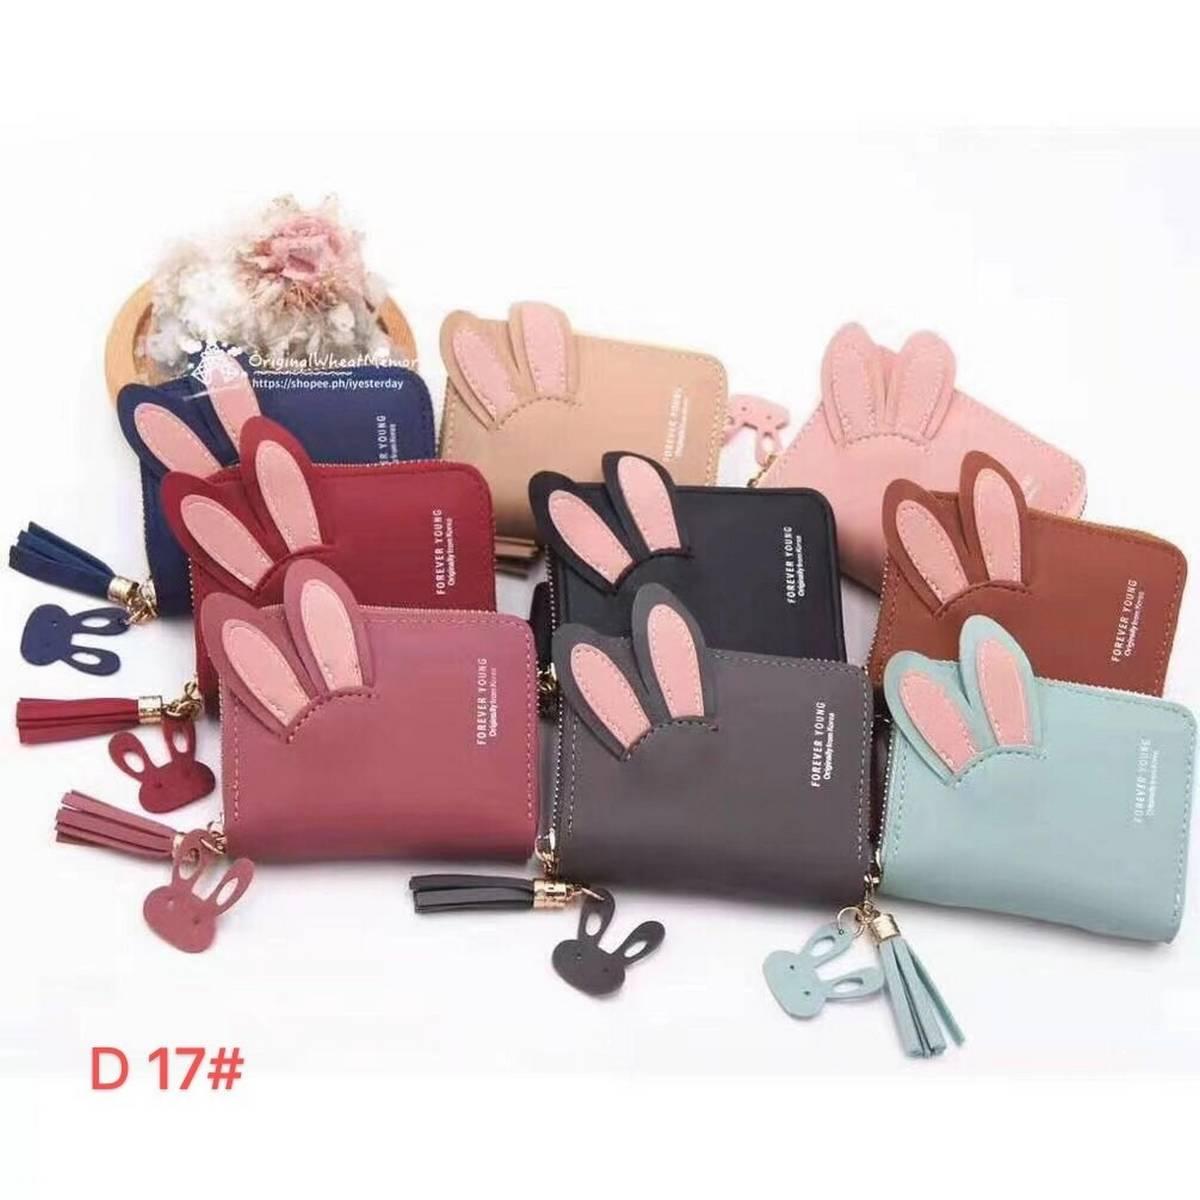 Bunny ears portable mini wallet womens Fashion Purse female short small wallets korean style student lovely pink purse female wallet.